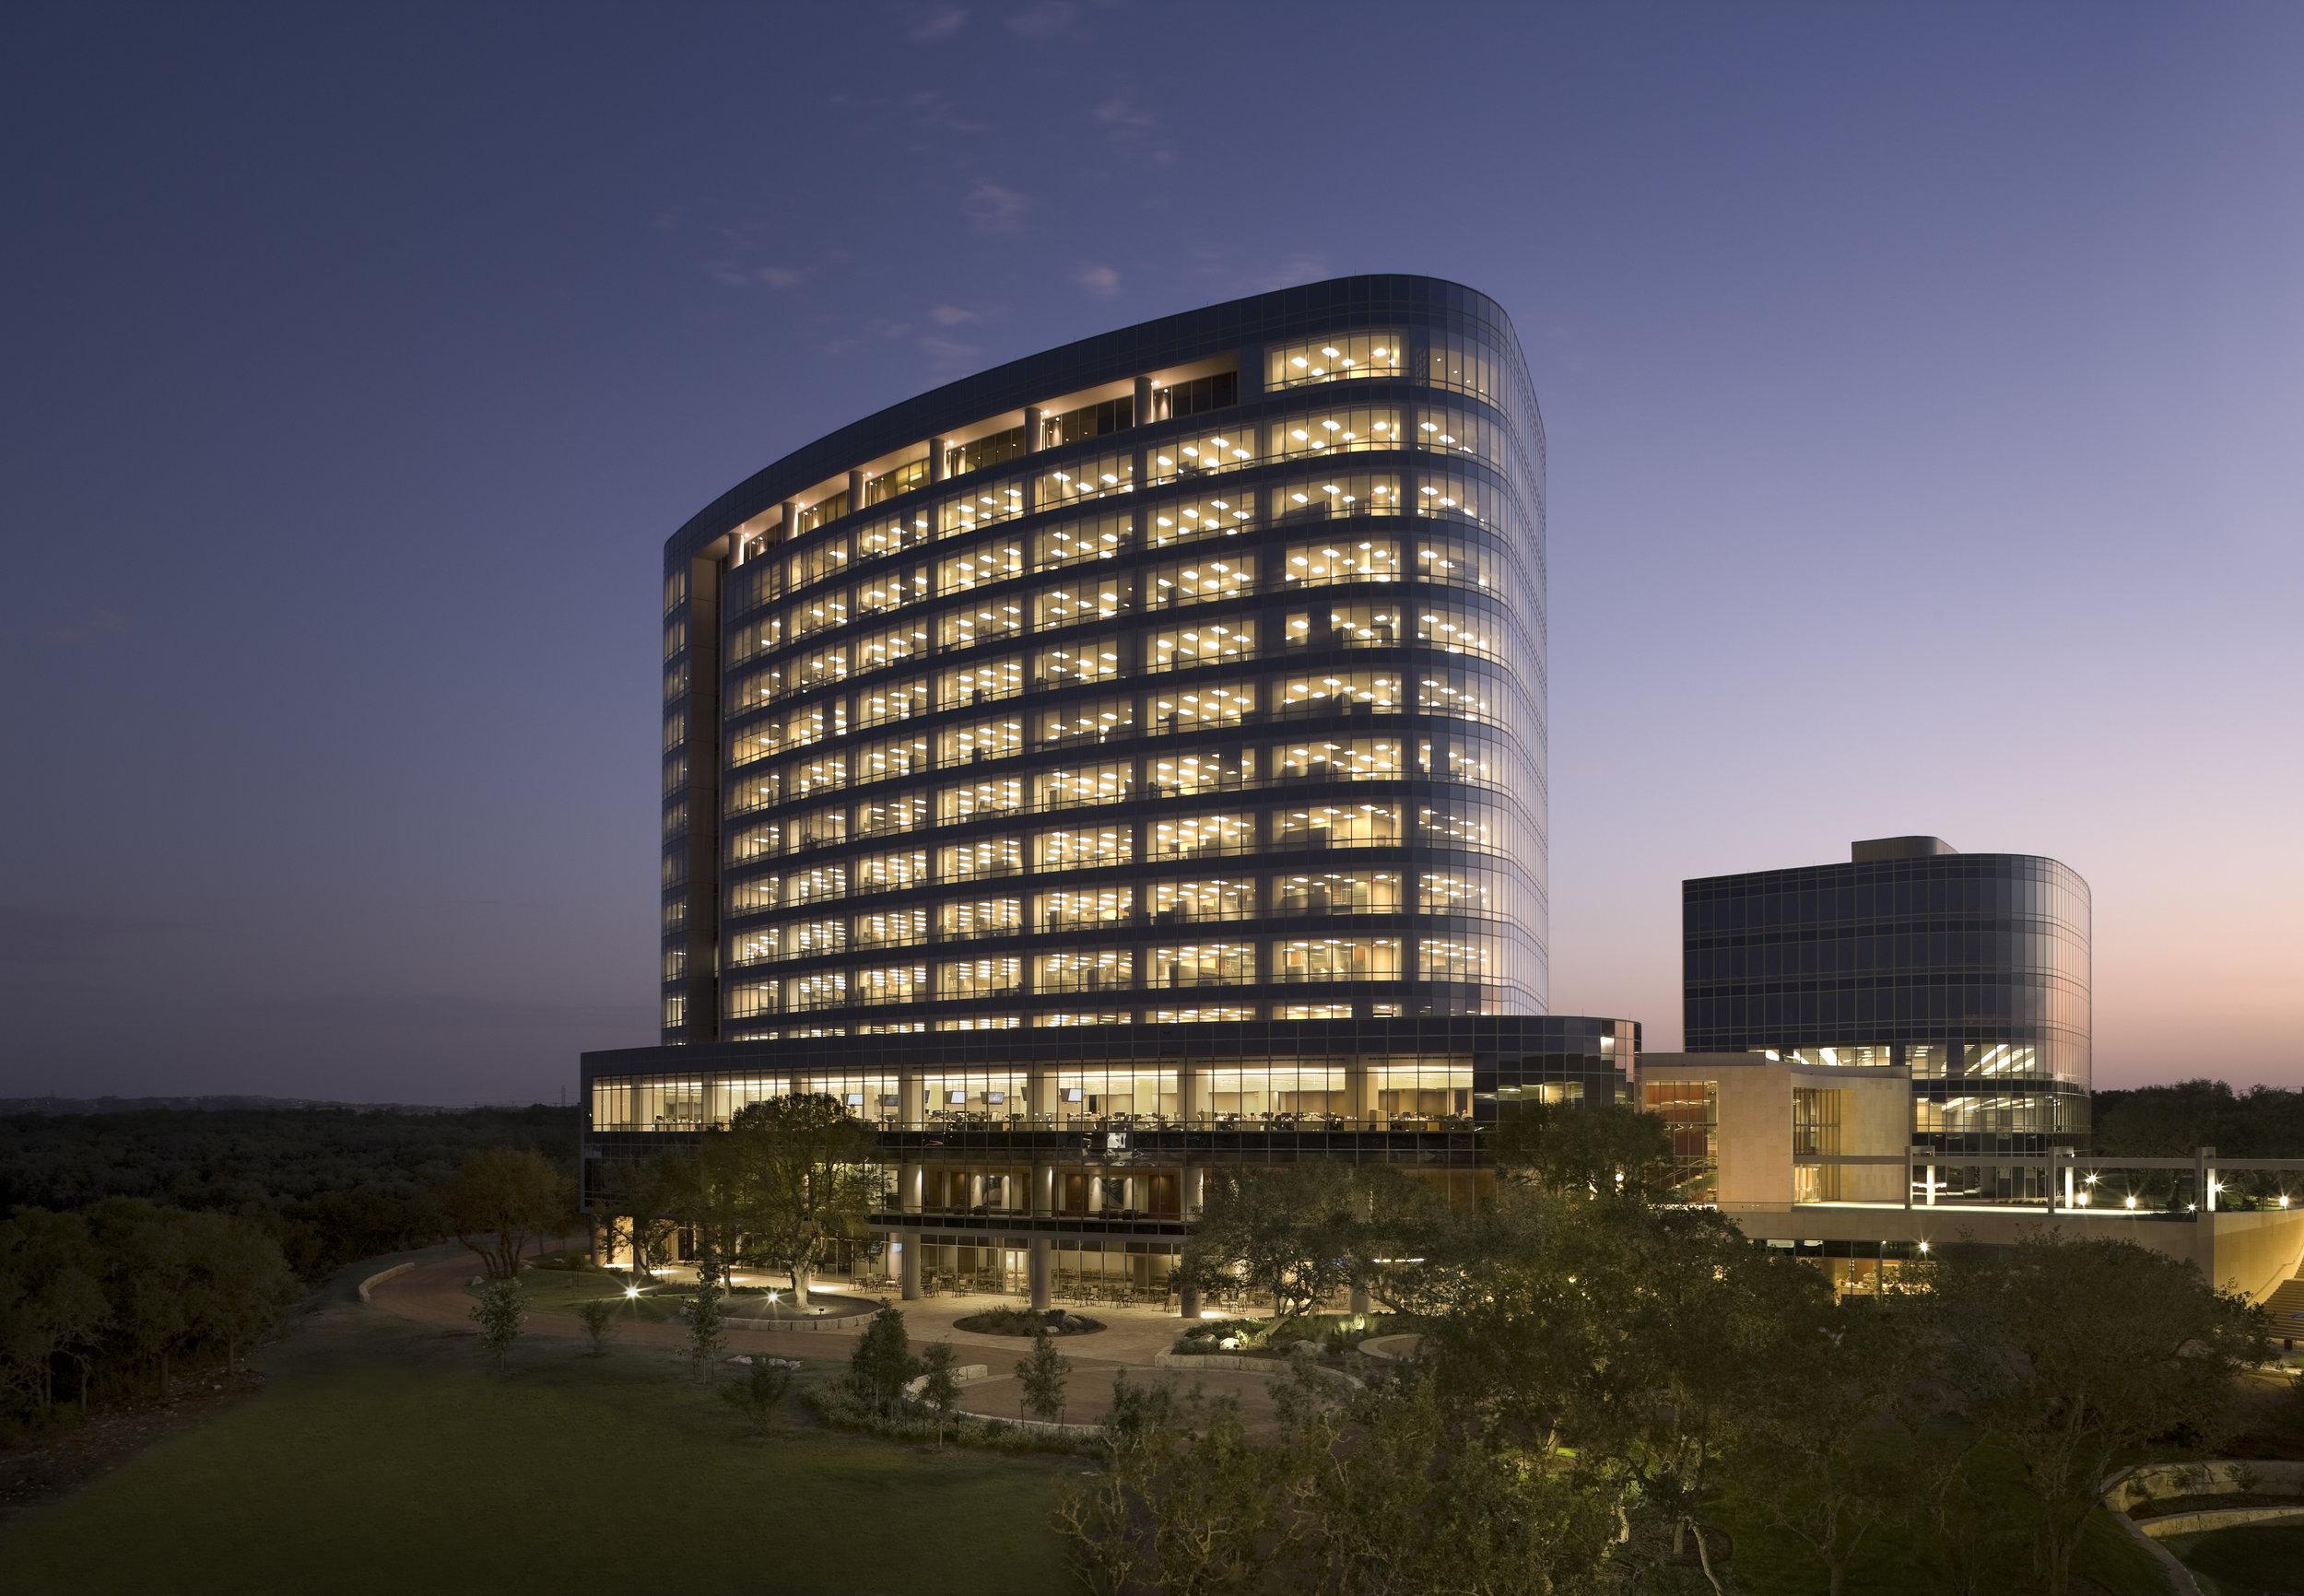 Tesoro Corporation Headquarters   San Antonio, Texas